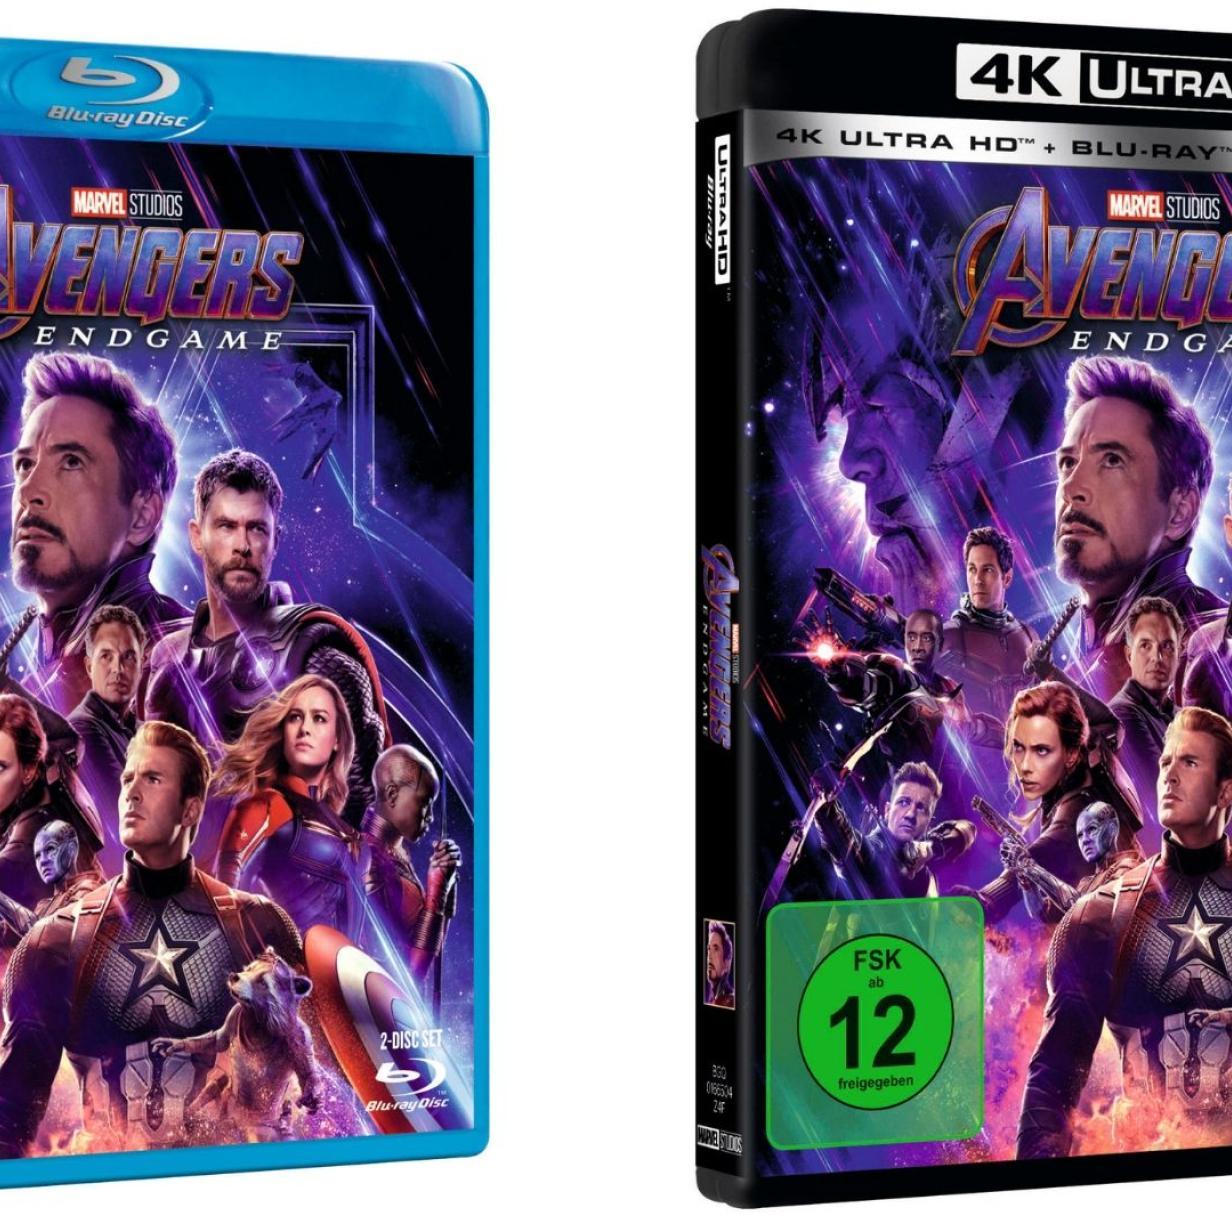 Avengers: Endgame - Blu-rays im Quiz gewinnen